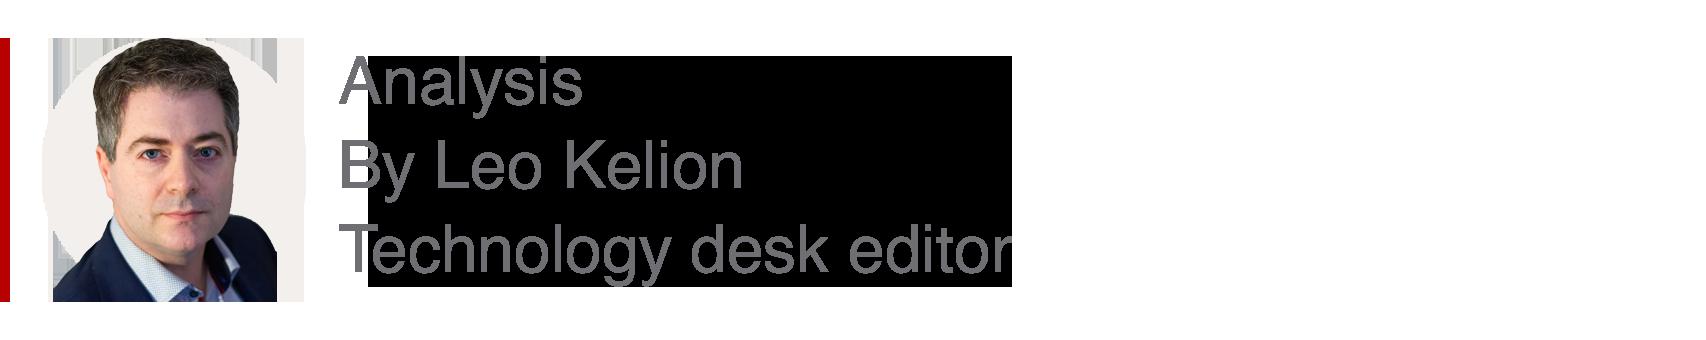 Analysis box by Leo Kelion, Technology desk editor